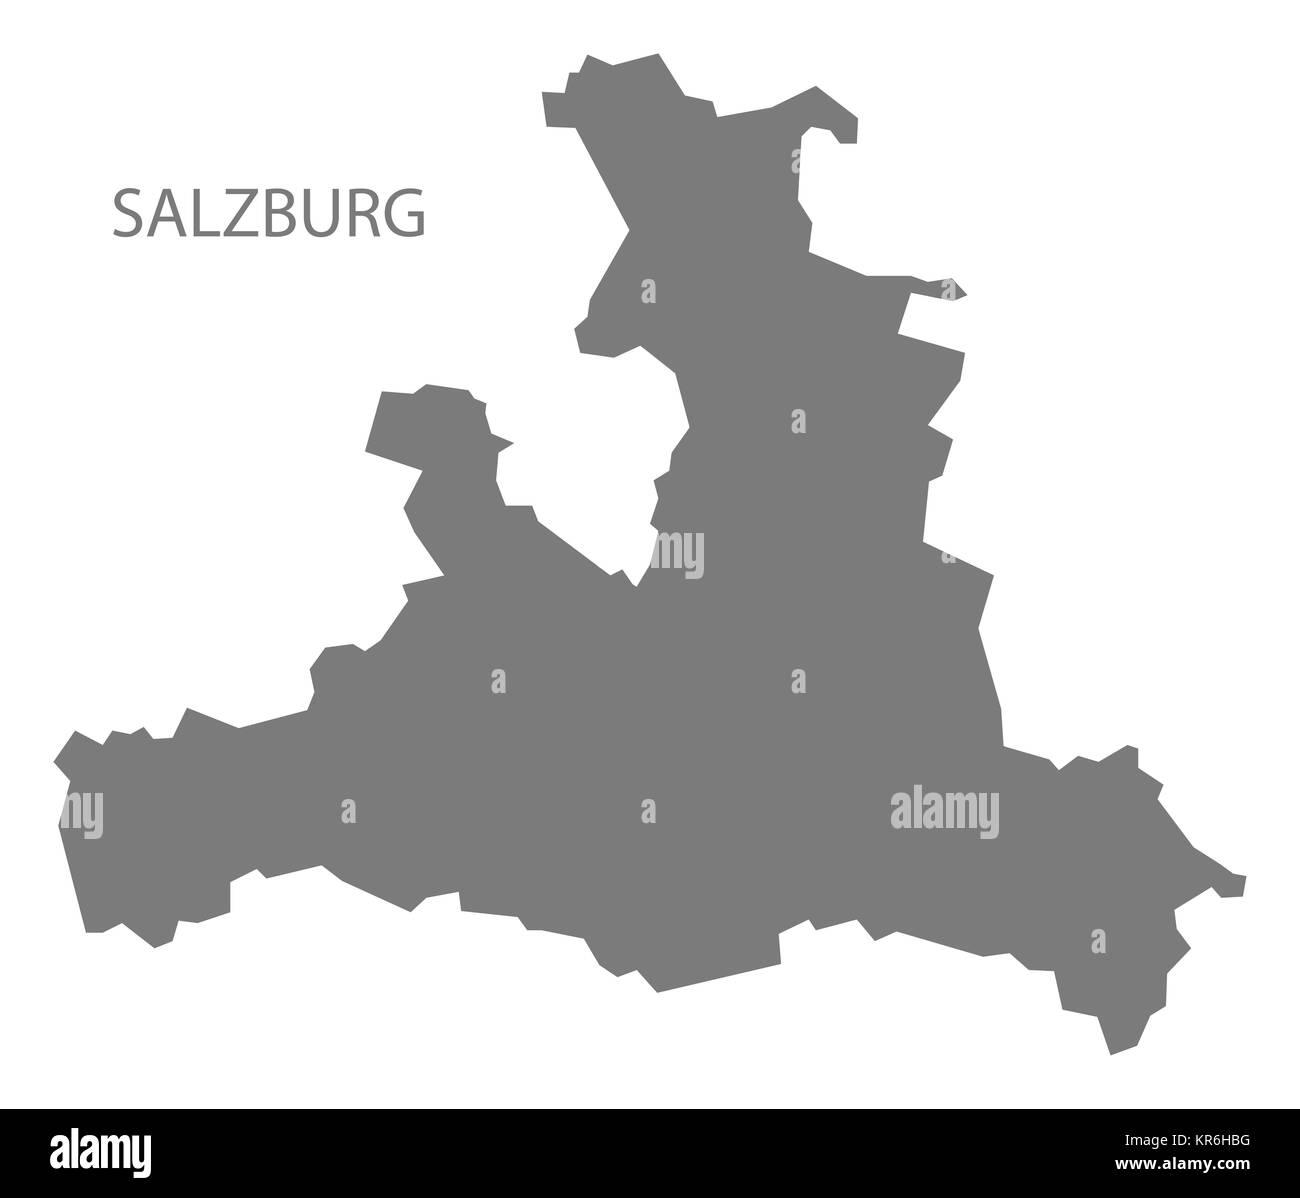 Salzburg Map Vector Stock Photos Salzburg Map Vector Stock